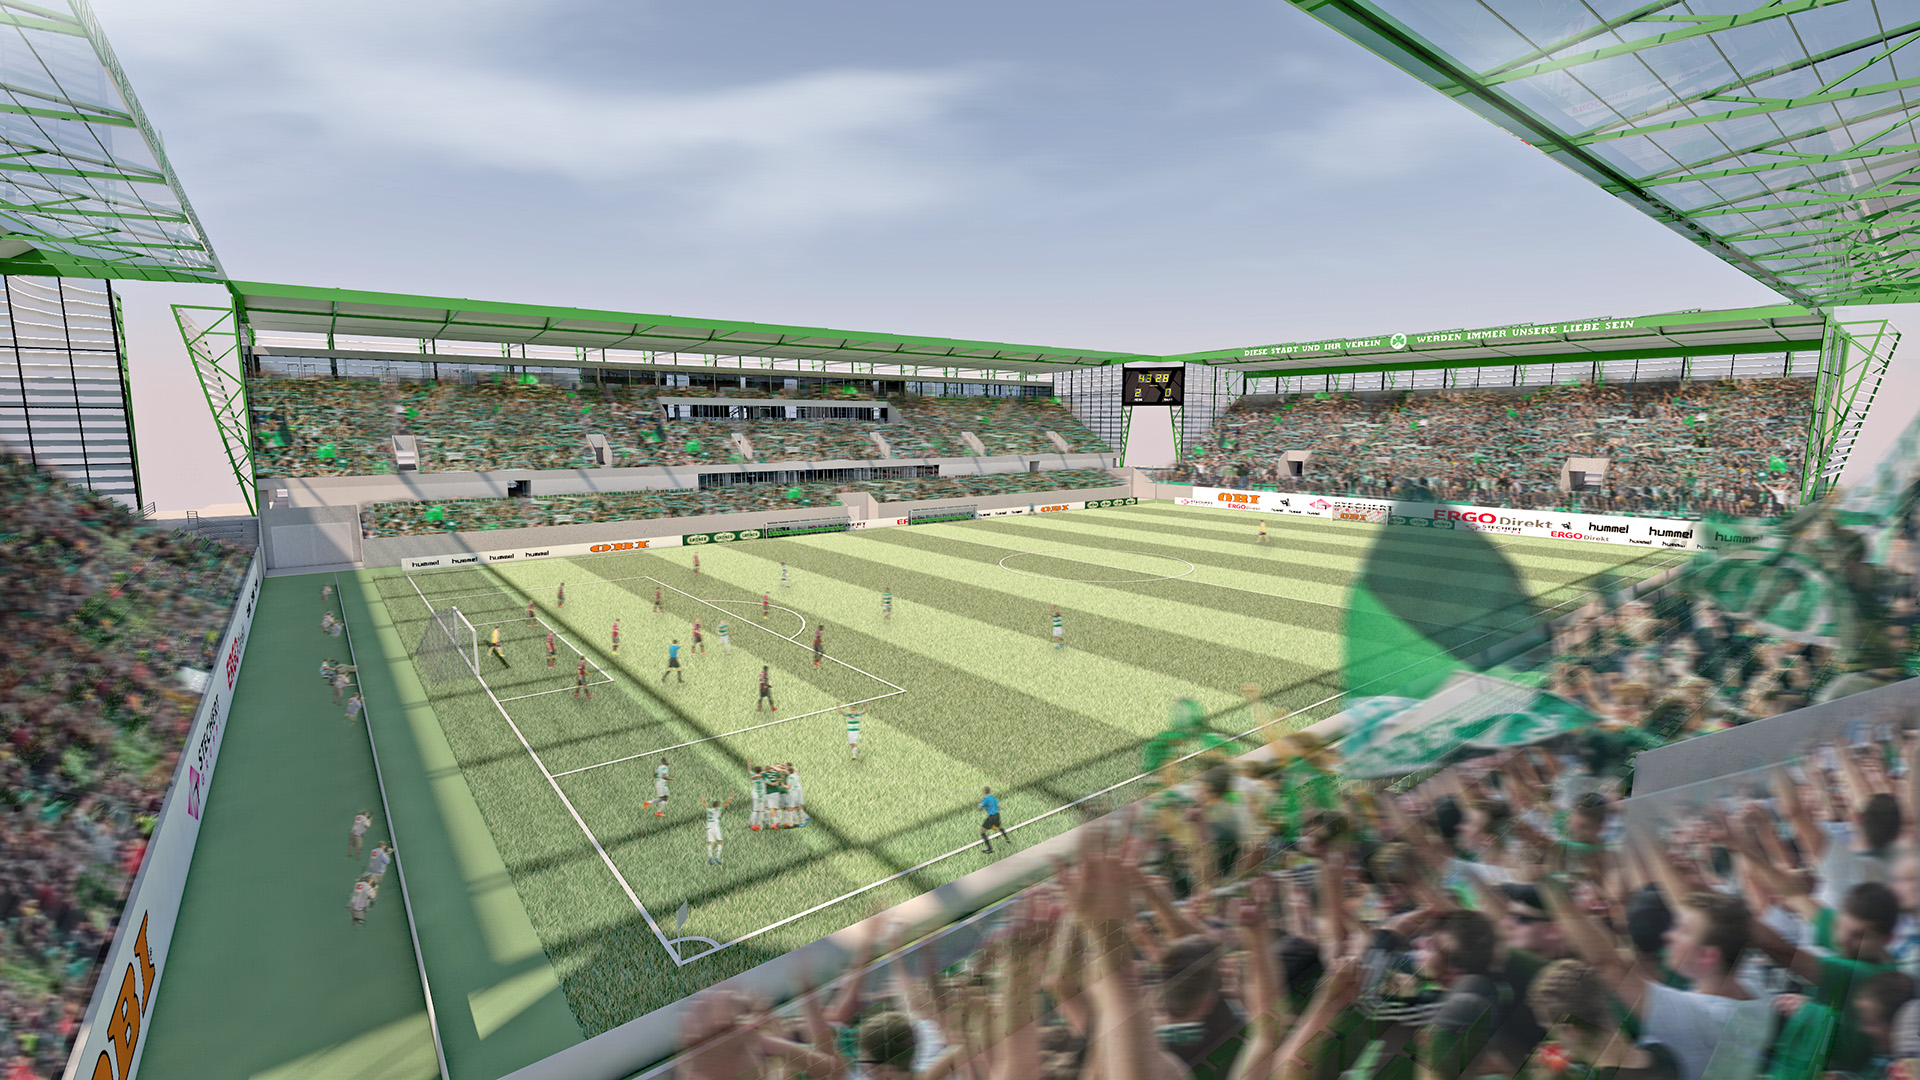 stadium f rth vision4venue we create homes for sport. Black Bedroom Furniture Sets. Home Design Ideas